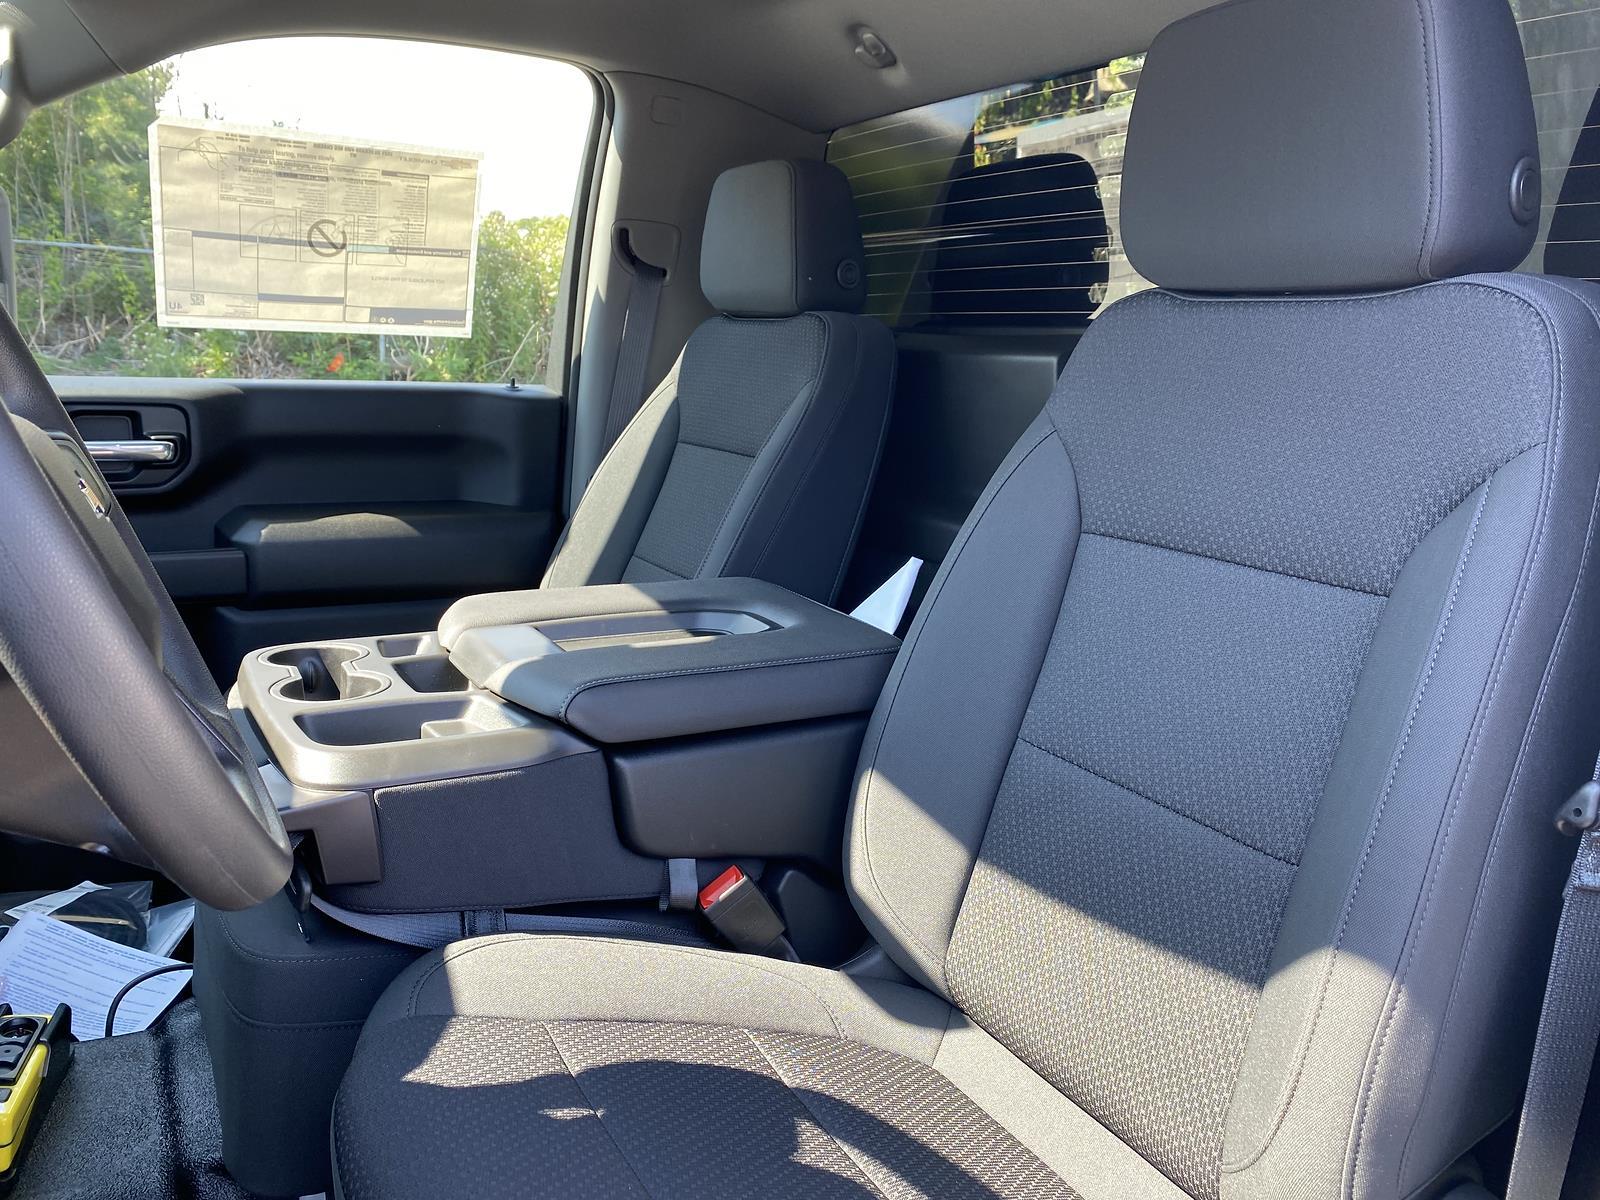 2021 Silverado 3500 Regular Cab 4x4,  Air-Flo Dump Body #W21550 - photo 6